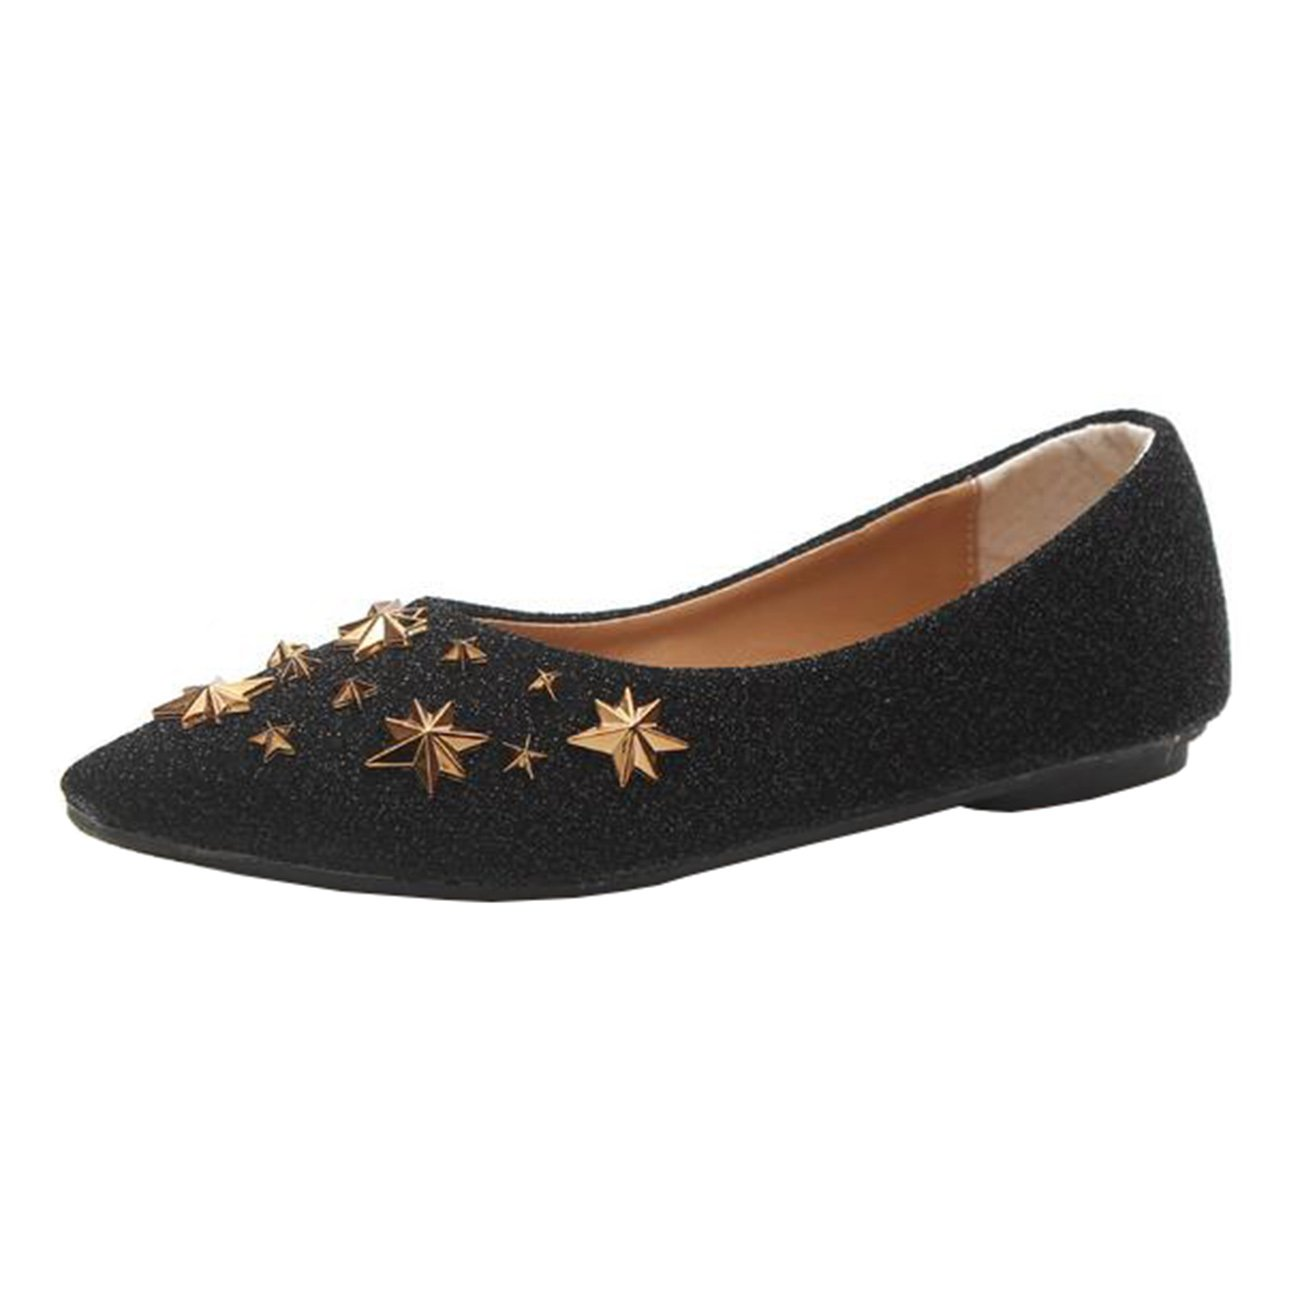 Mashiaoyi Womens Pointed-Toe Flat Slip-on Metal Ballet Flats